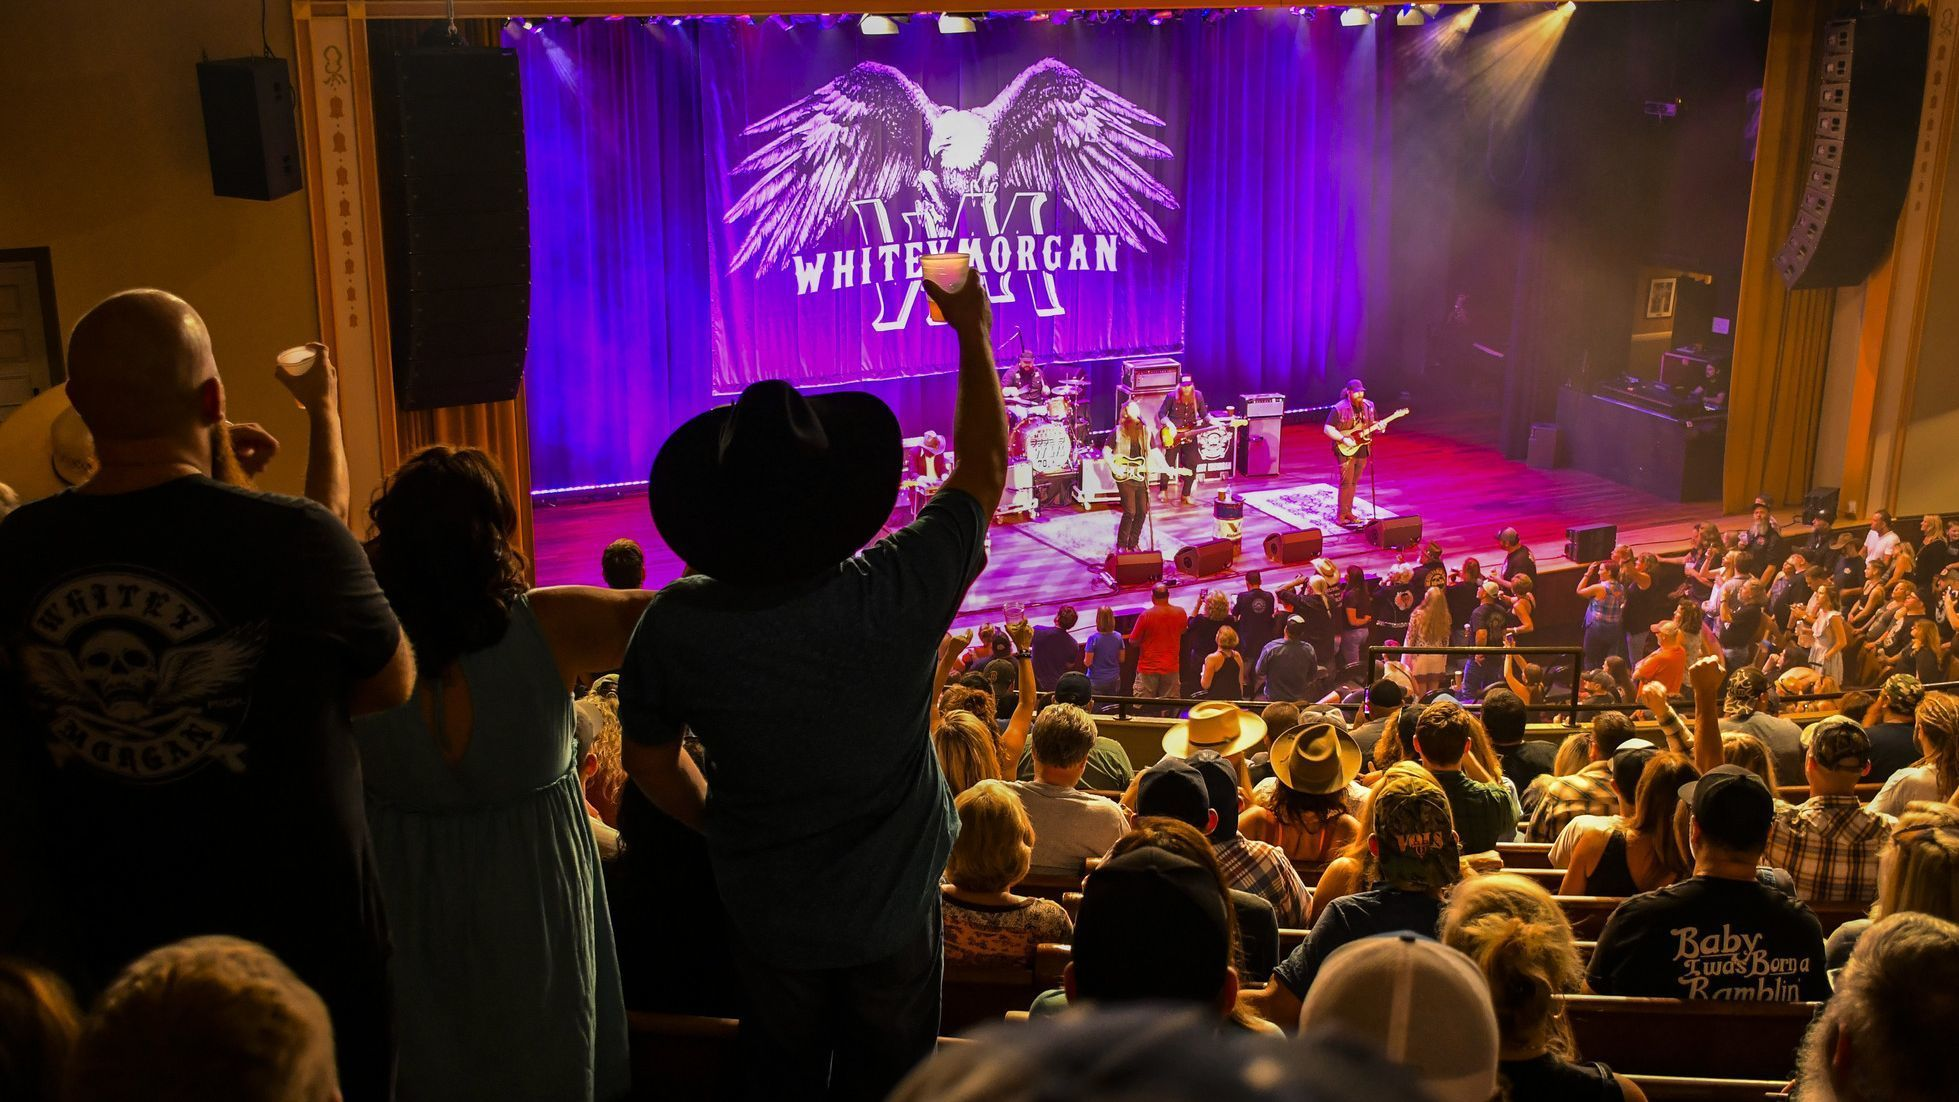 NASHVILLE, TN - Whitey Morgan and his band, the 78s, play Nashville's Ryman Auditorium.